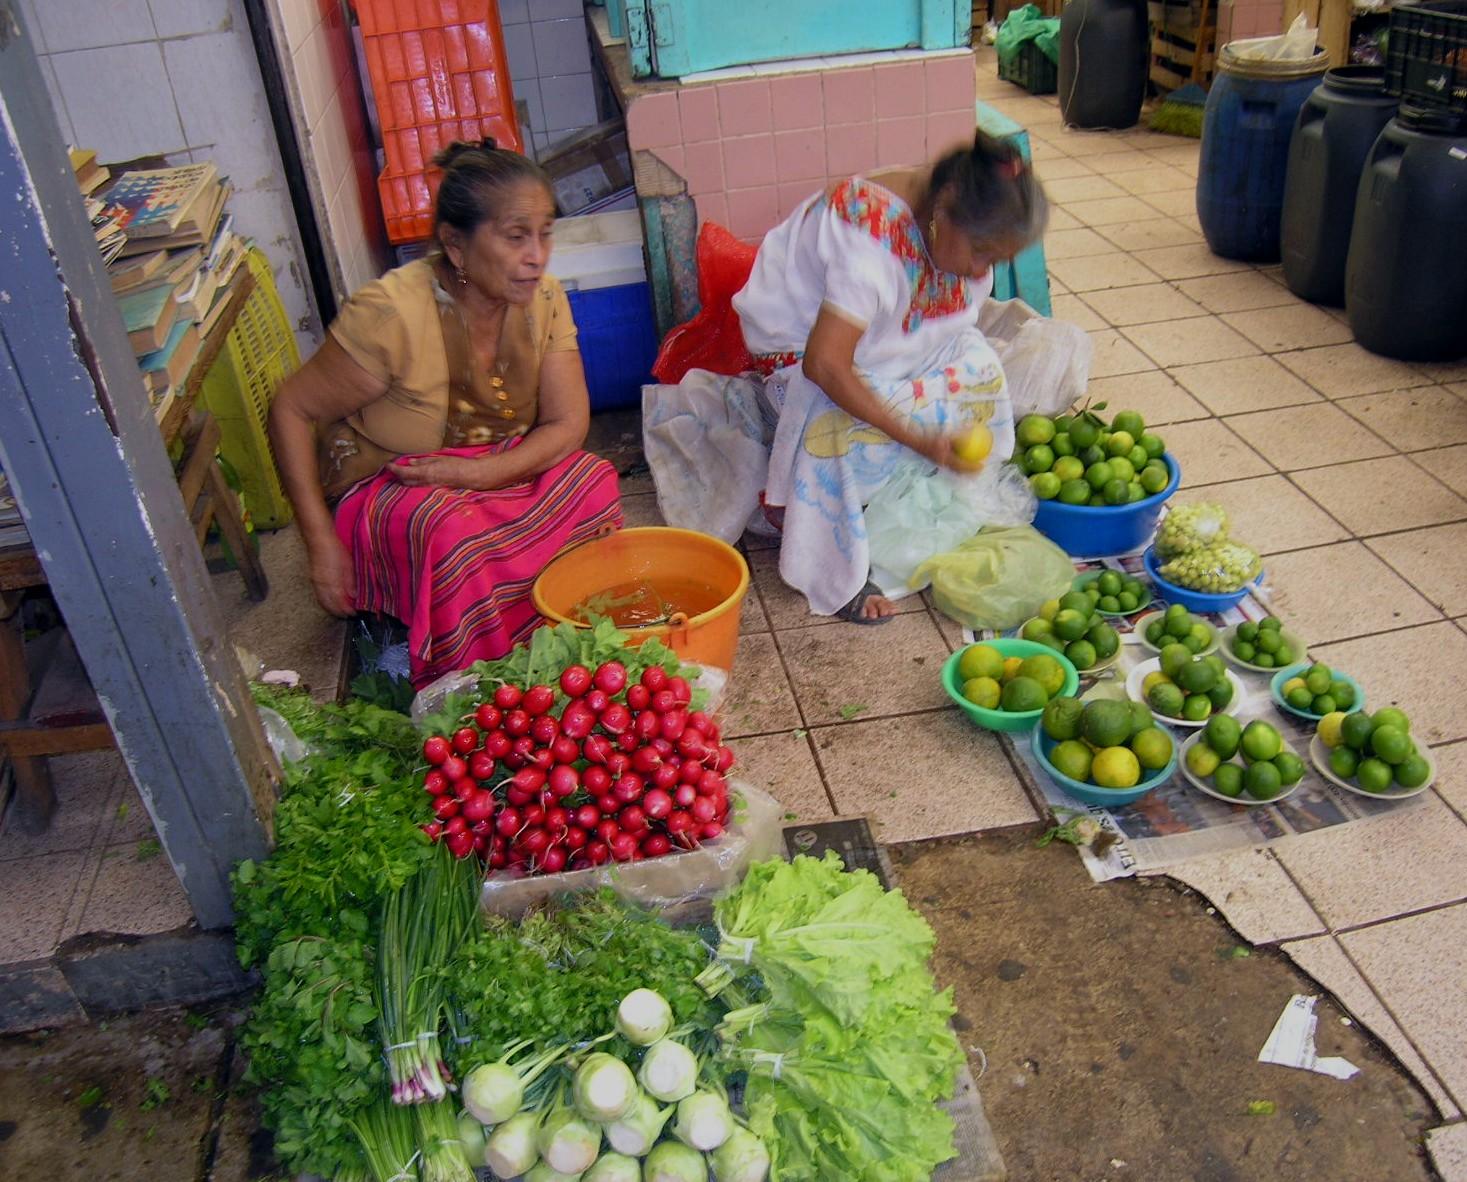 Feb 14 Merida Market women.jpg